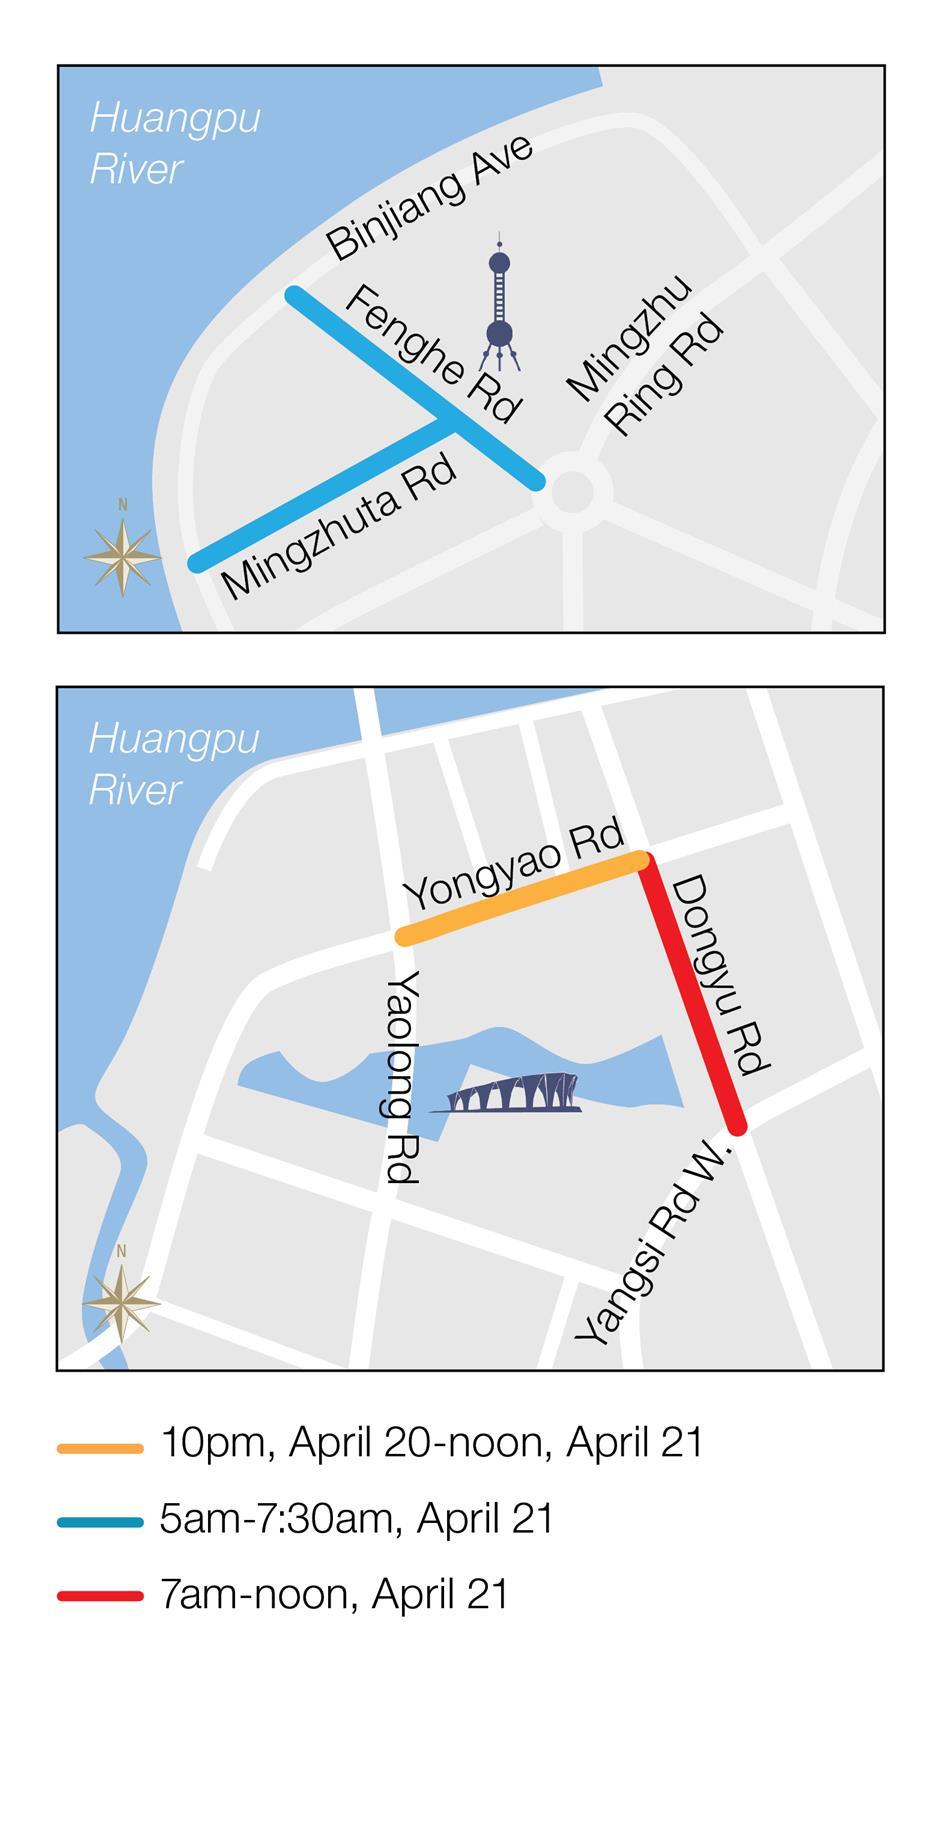 Road closures in Pudong for half marathon